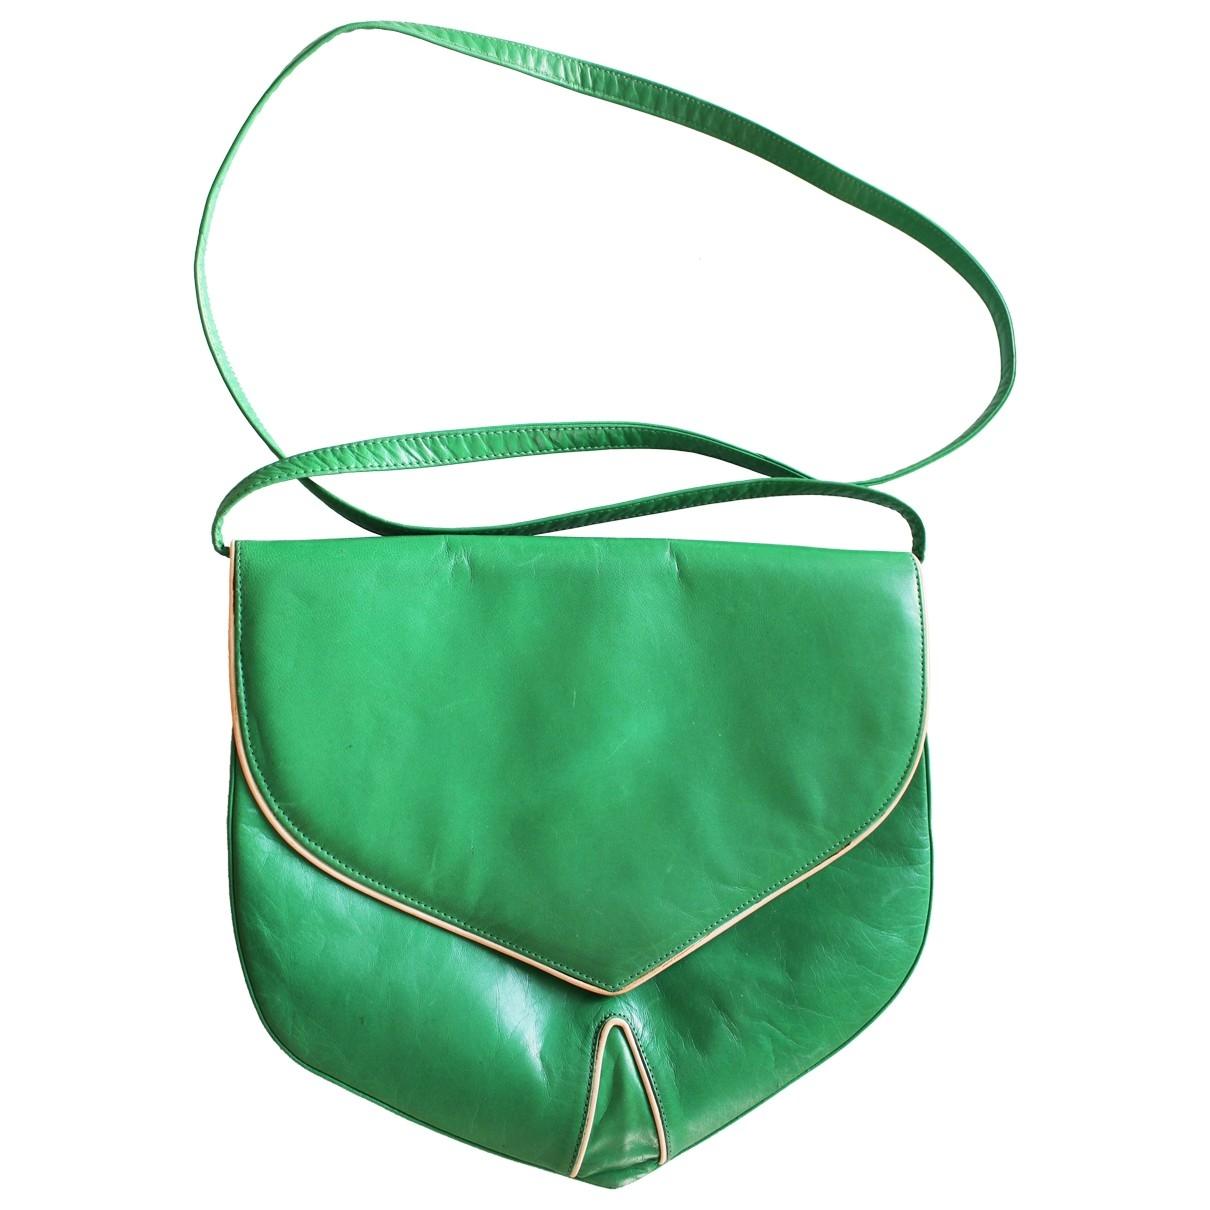 Charles Jourdan \N Handtasche in  Gruen Leder